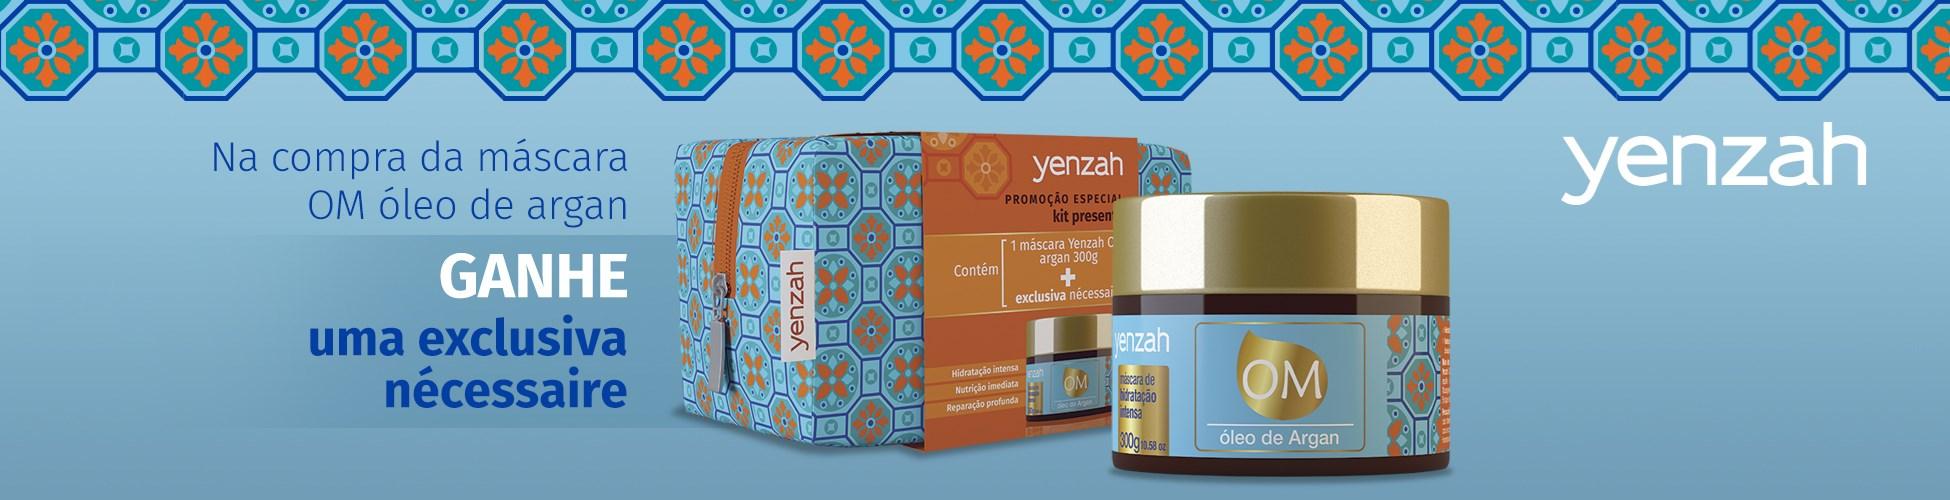 Promoção Yenzah